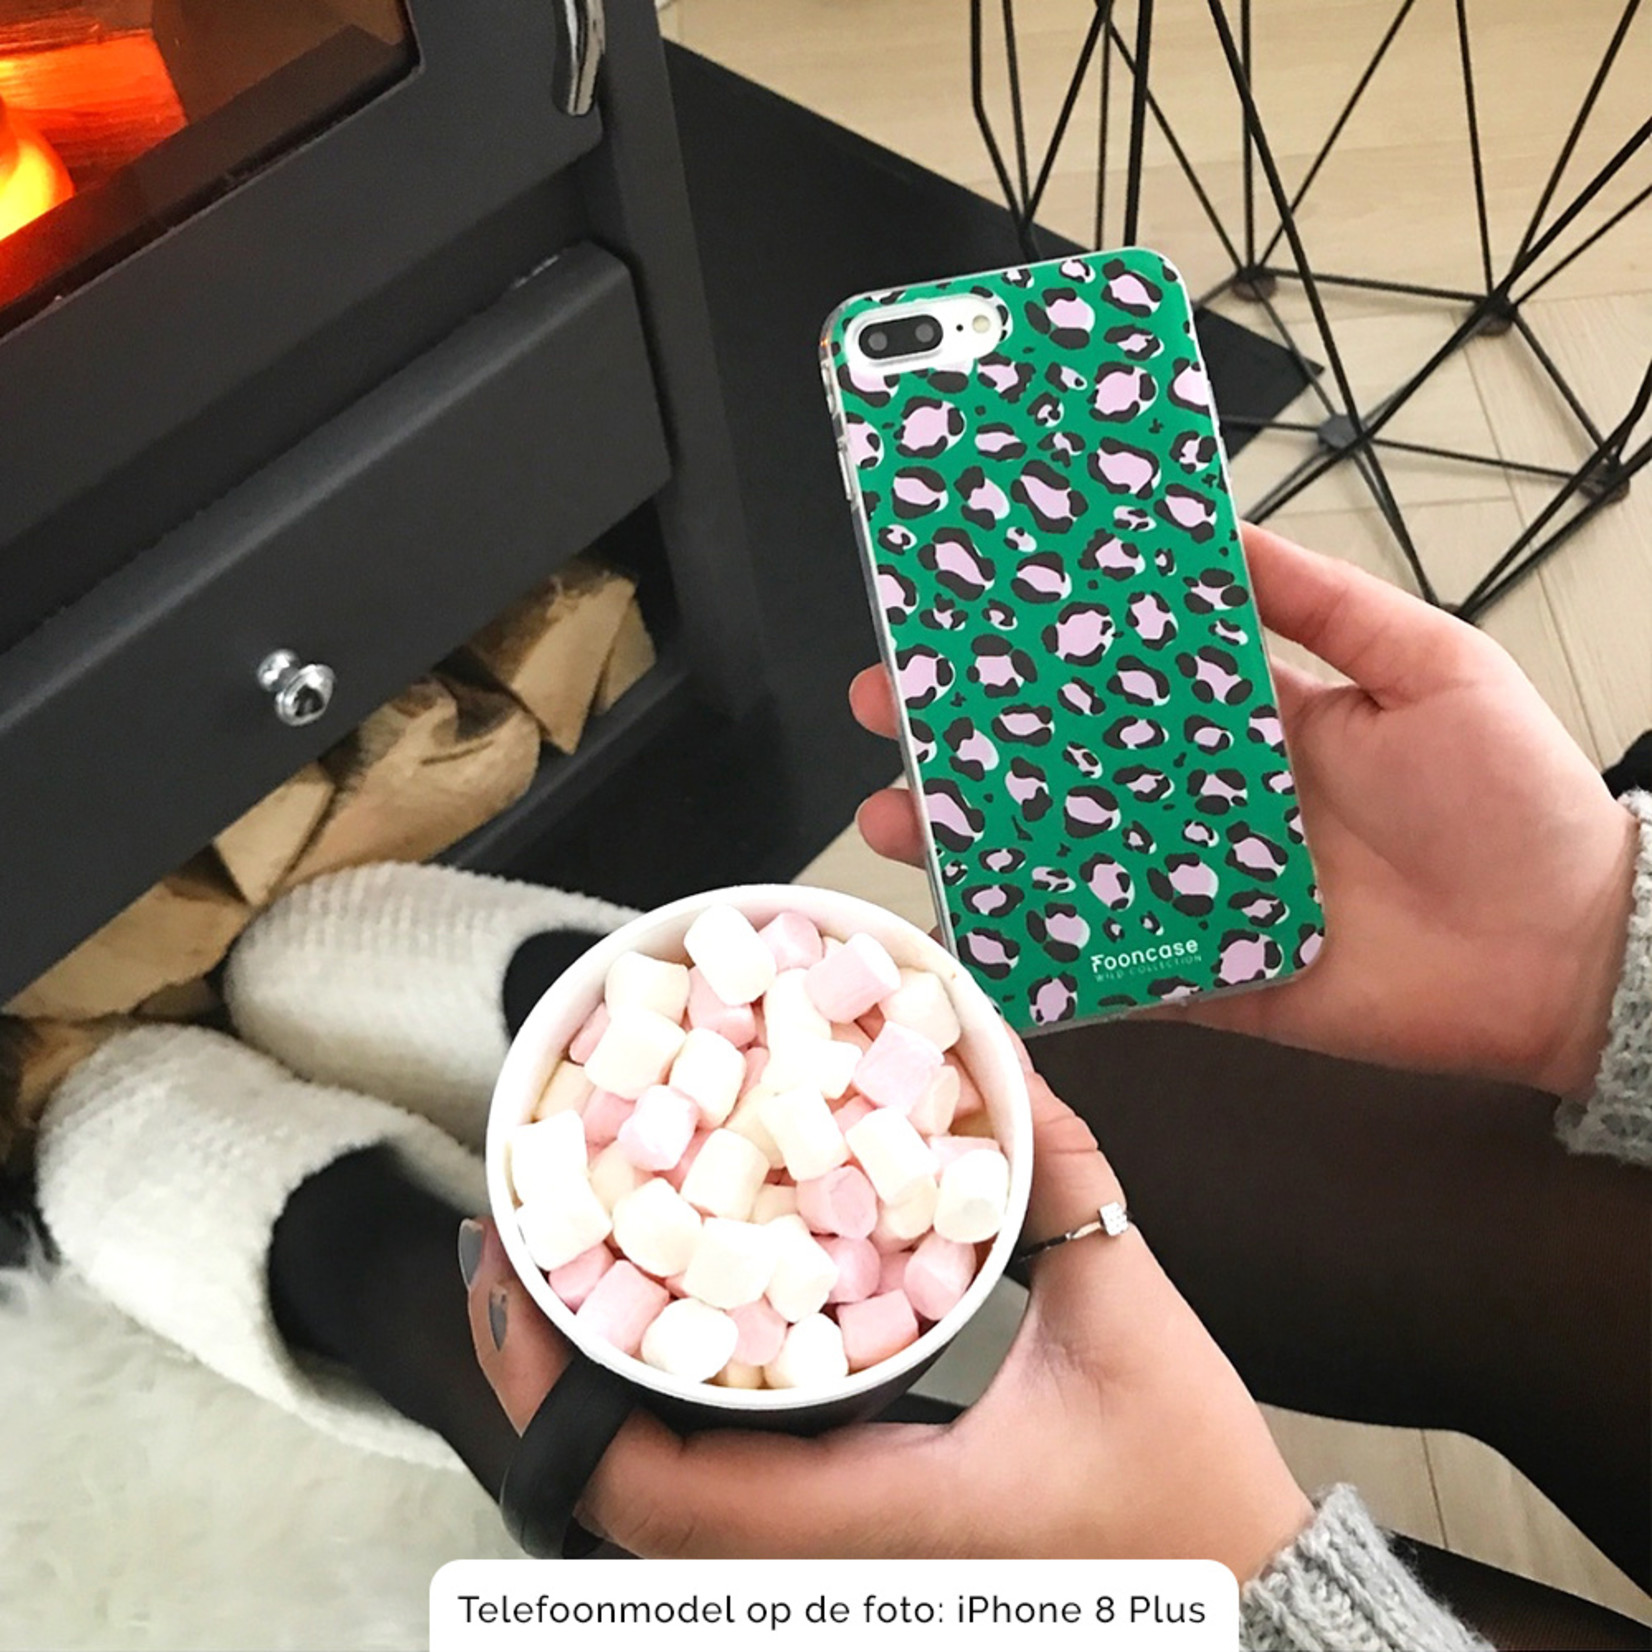 FOONCASE Huawei P10 Lite hoesje TPU Soft Case - Back Cover - WILD COLLECTION / Luipaard / Leopard print / Groen